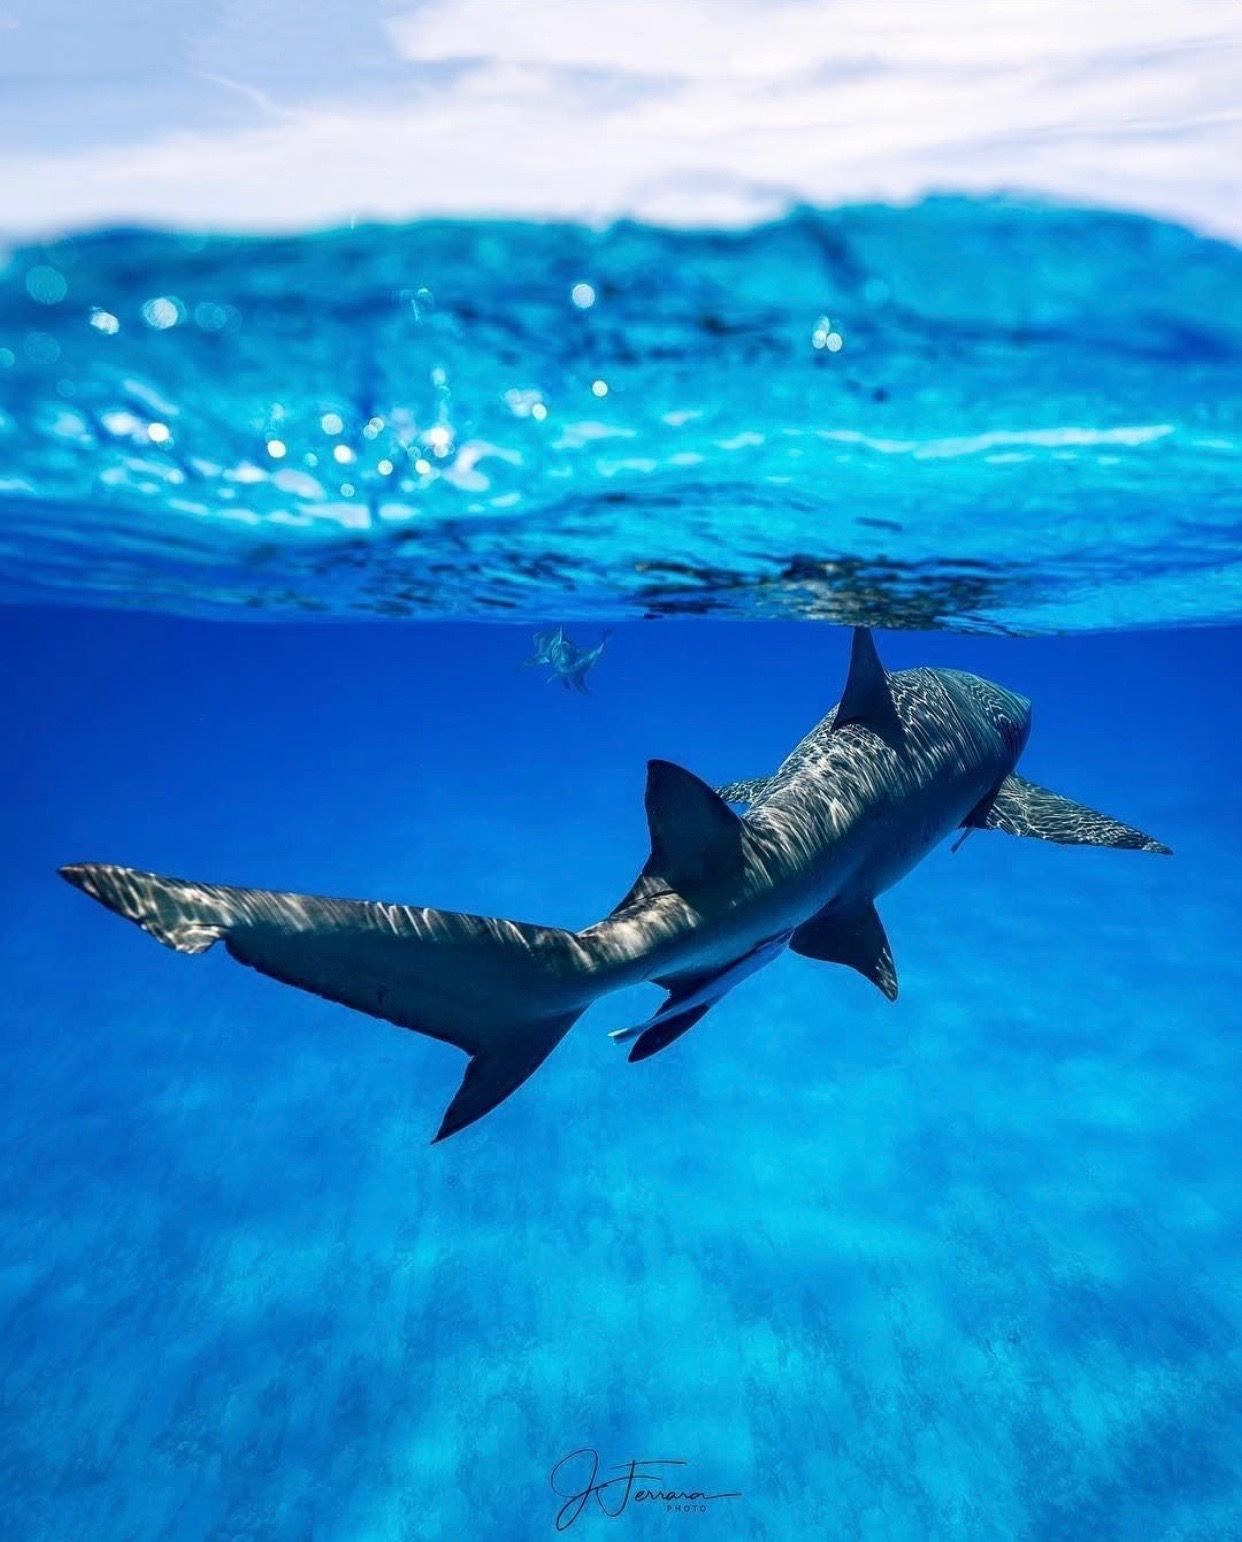 Un Requin サメ 魚 水中